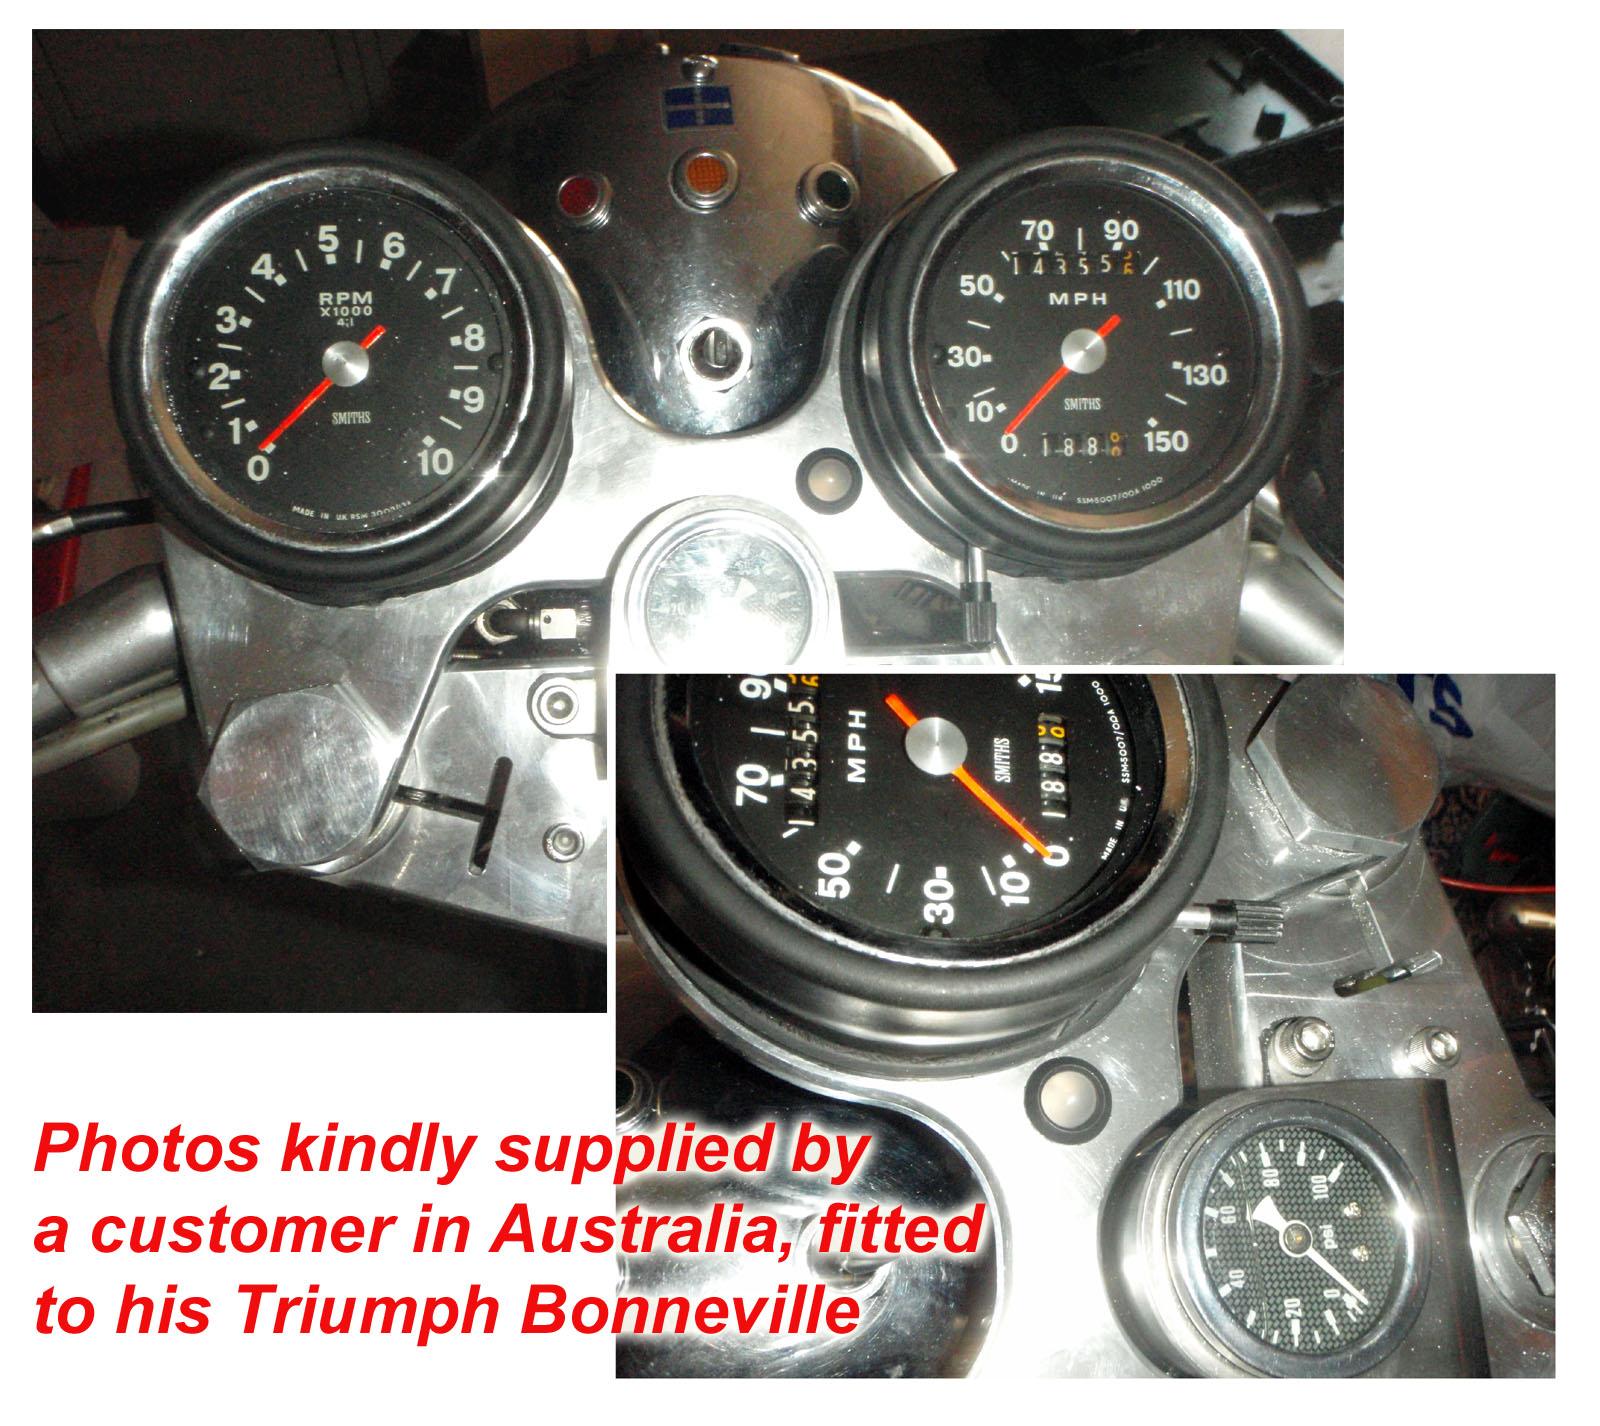 Icmcom Battery Alternator Ignition Warning Lights Charge Monitors Free Harley Davidson Wiring Diagrams 1973 Triumph Bonneville Light